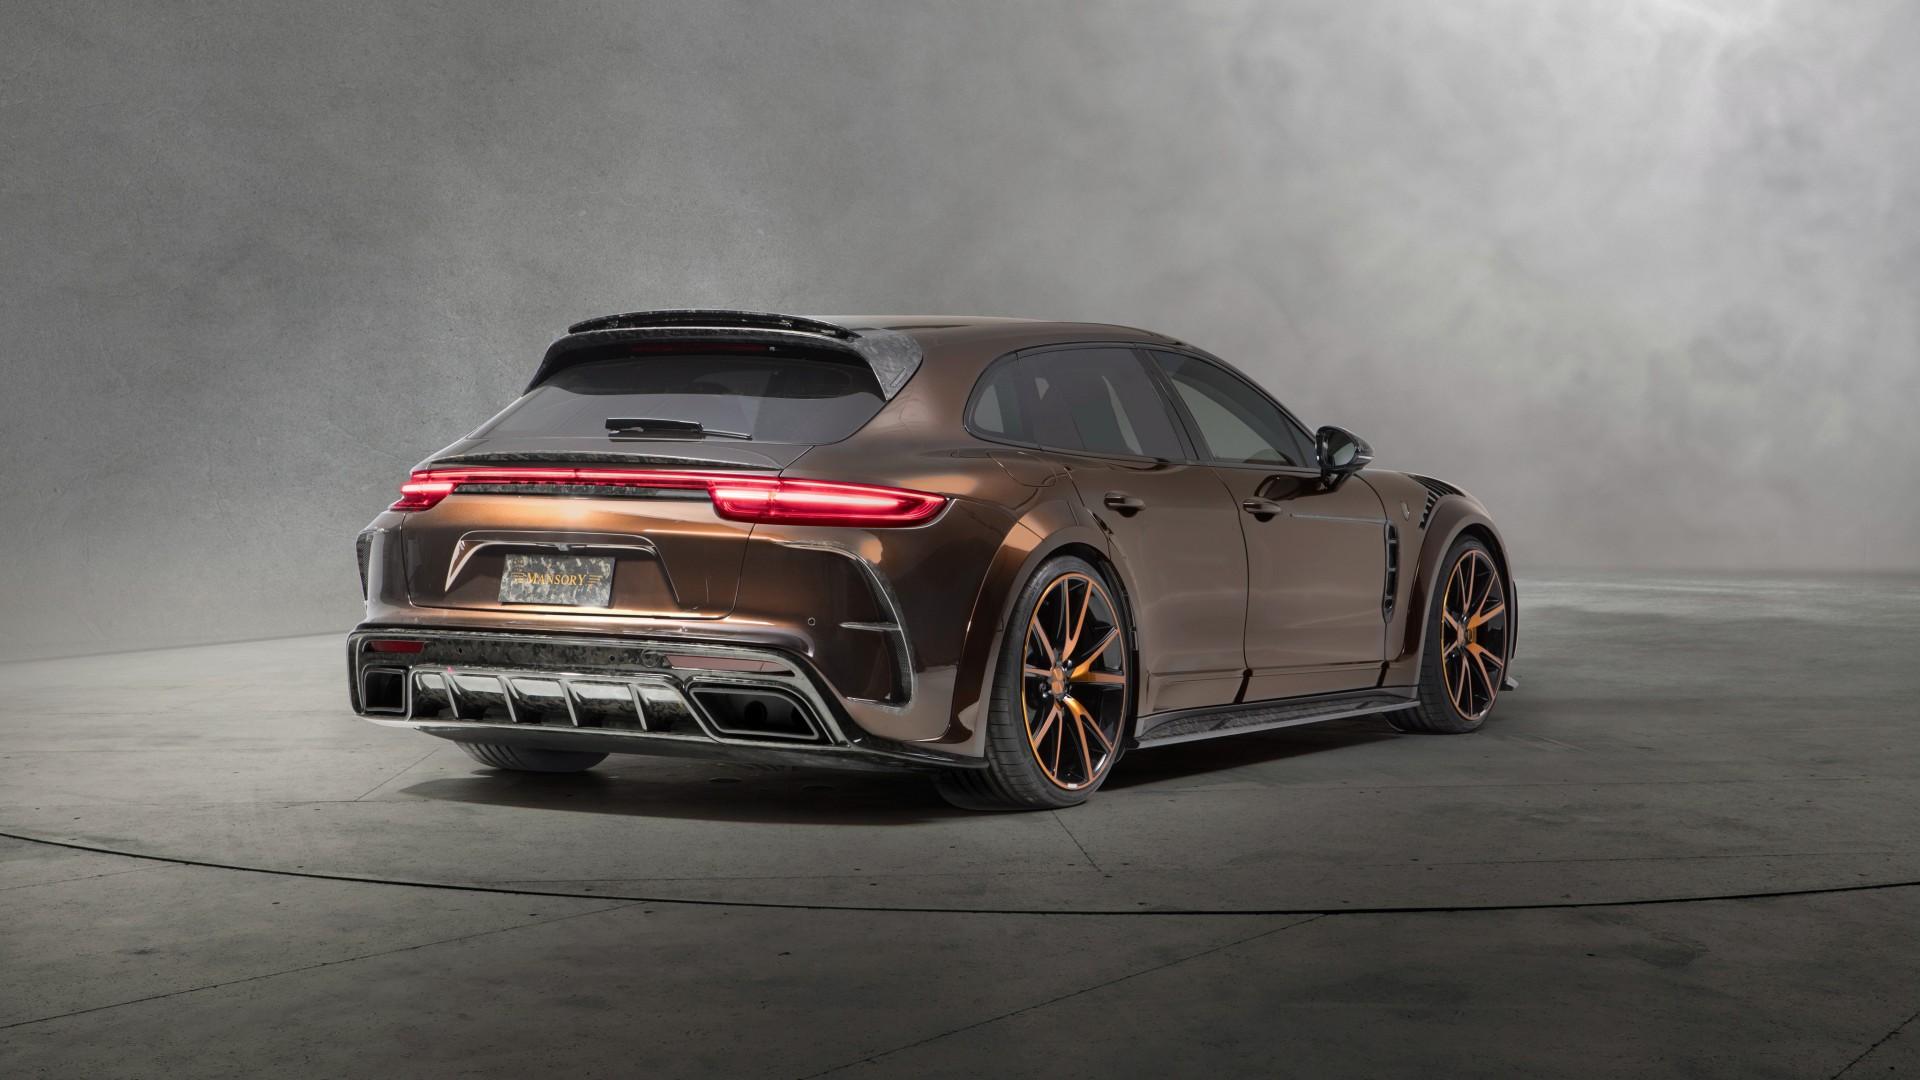 Porsche 911 R >> 2018 Mansory Porsche Panamera Sport Turismo 4K 2 Wallpaper | HD Car Wallpapers | ID #9835